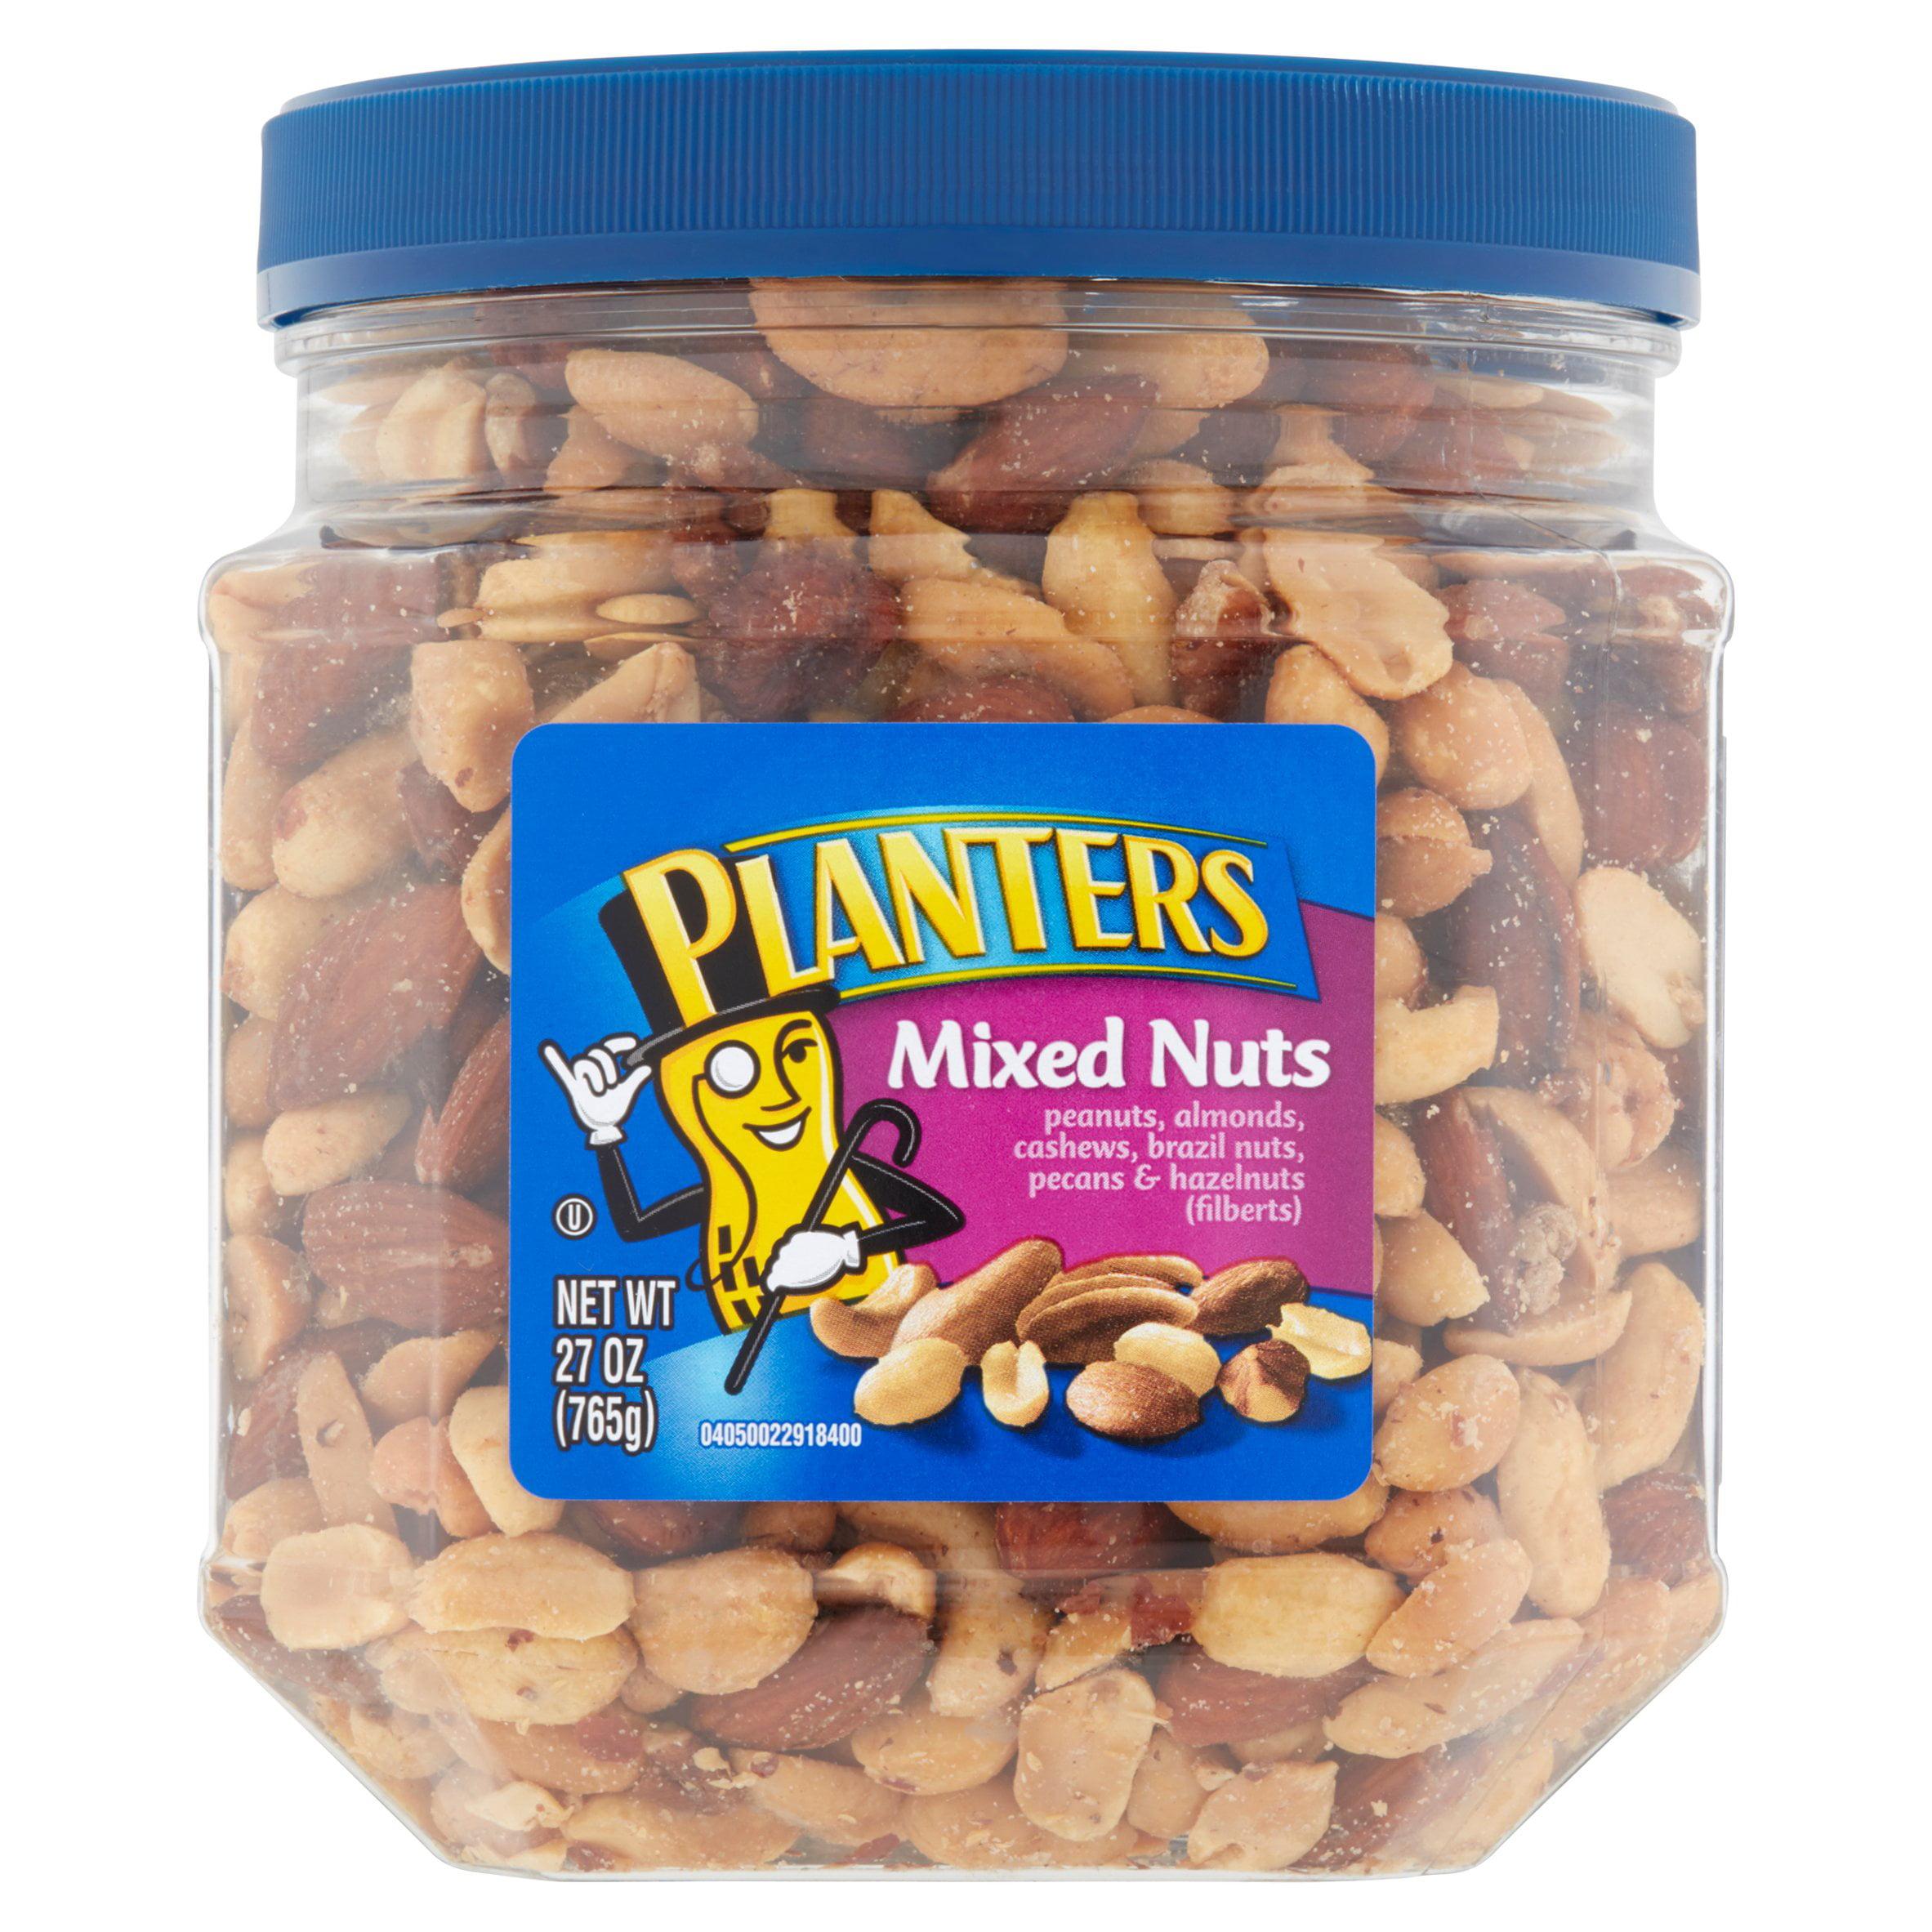 Planters Mixed Nuts: Peanut, Almond, Cashew, Brazil Nut, Pecan, Hazelnut, 27 OZ (765g) by Kraft Foods Group, Inc.